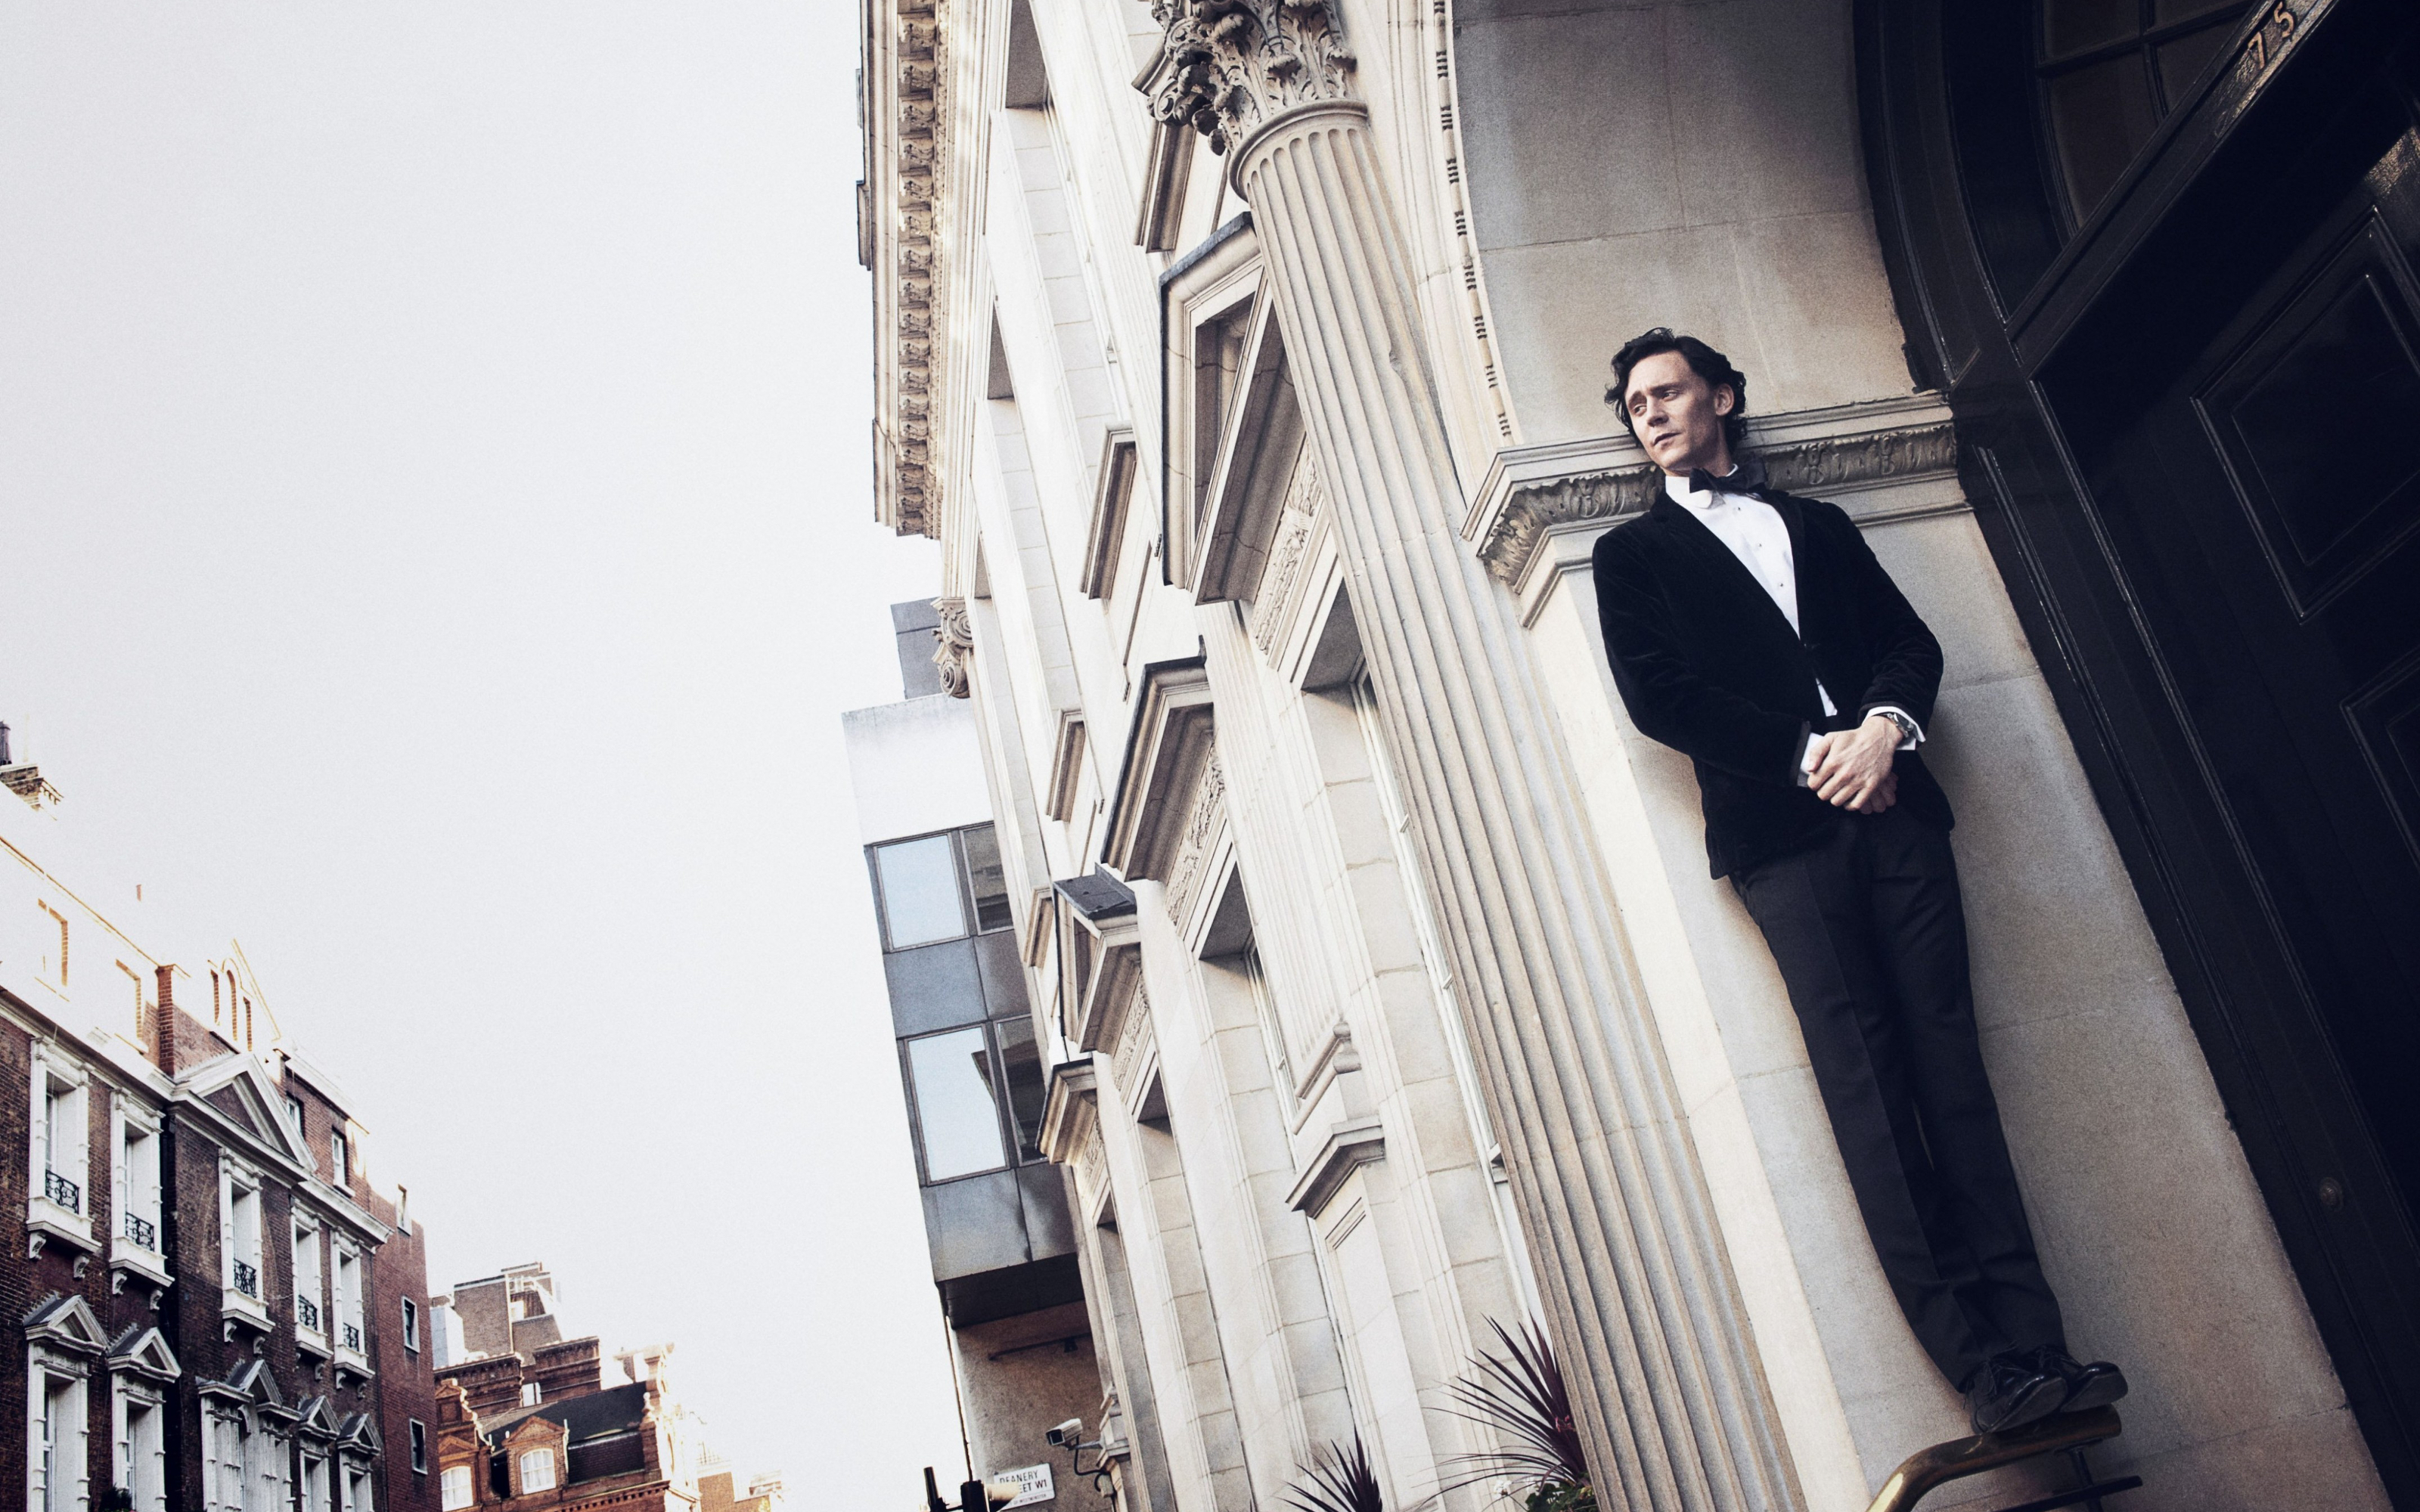 Tom Hiddleston Wallpapers ID493063